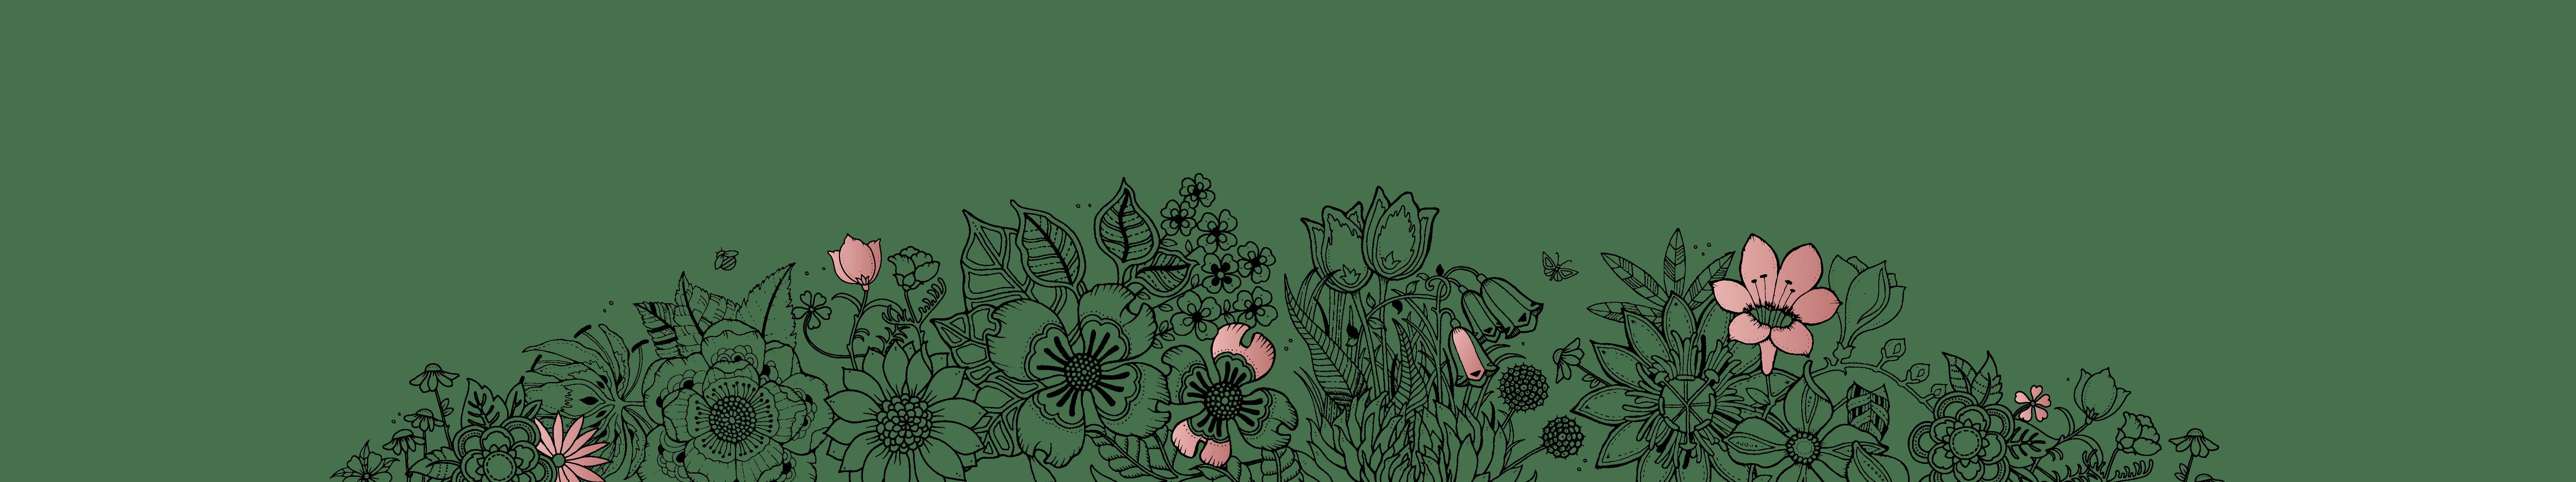 Flourish The Free Colouring Book Johanna Basford Johanna Basford